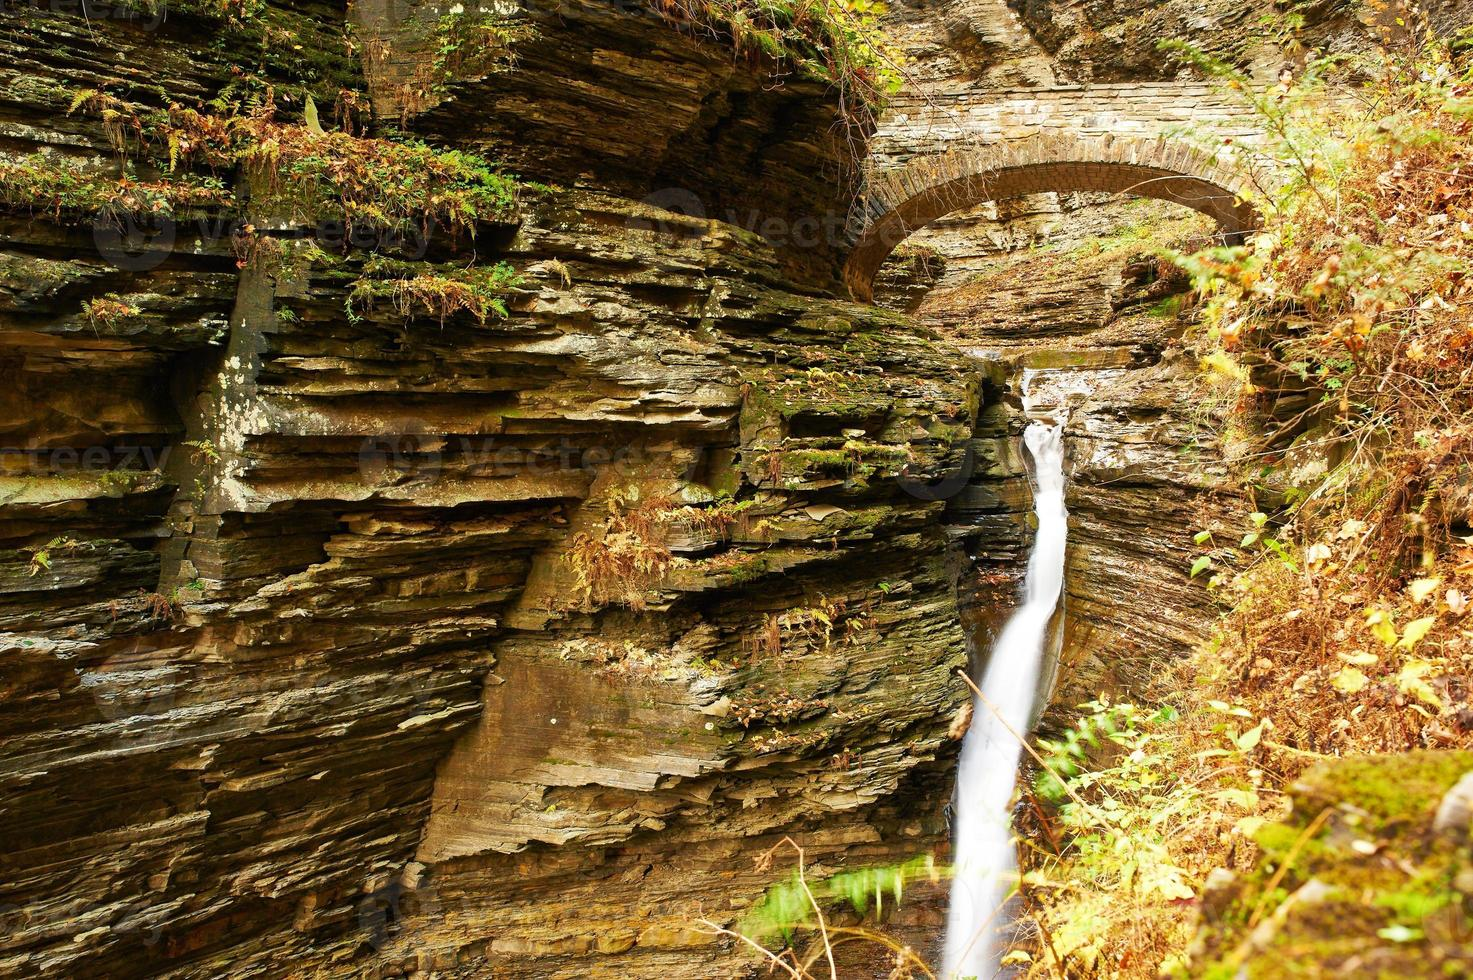 Cave waterfall at Watkins Glen state park photo